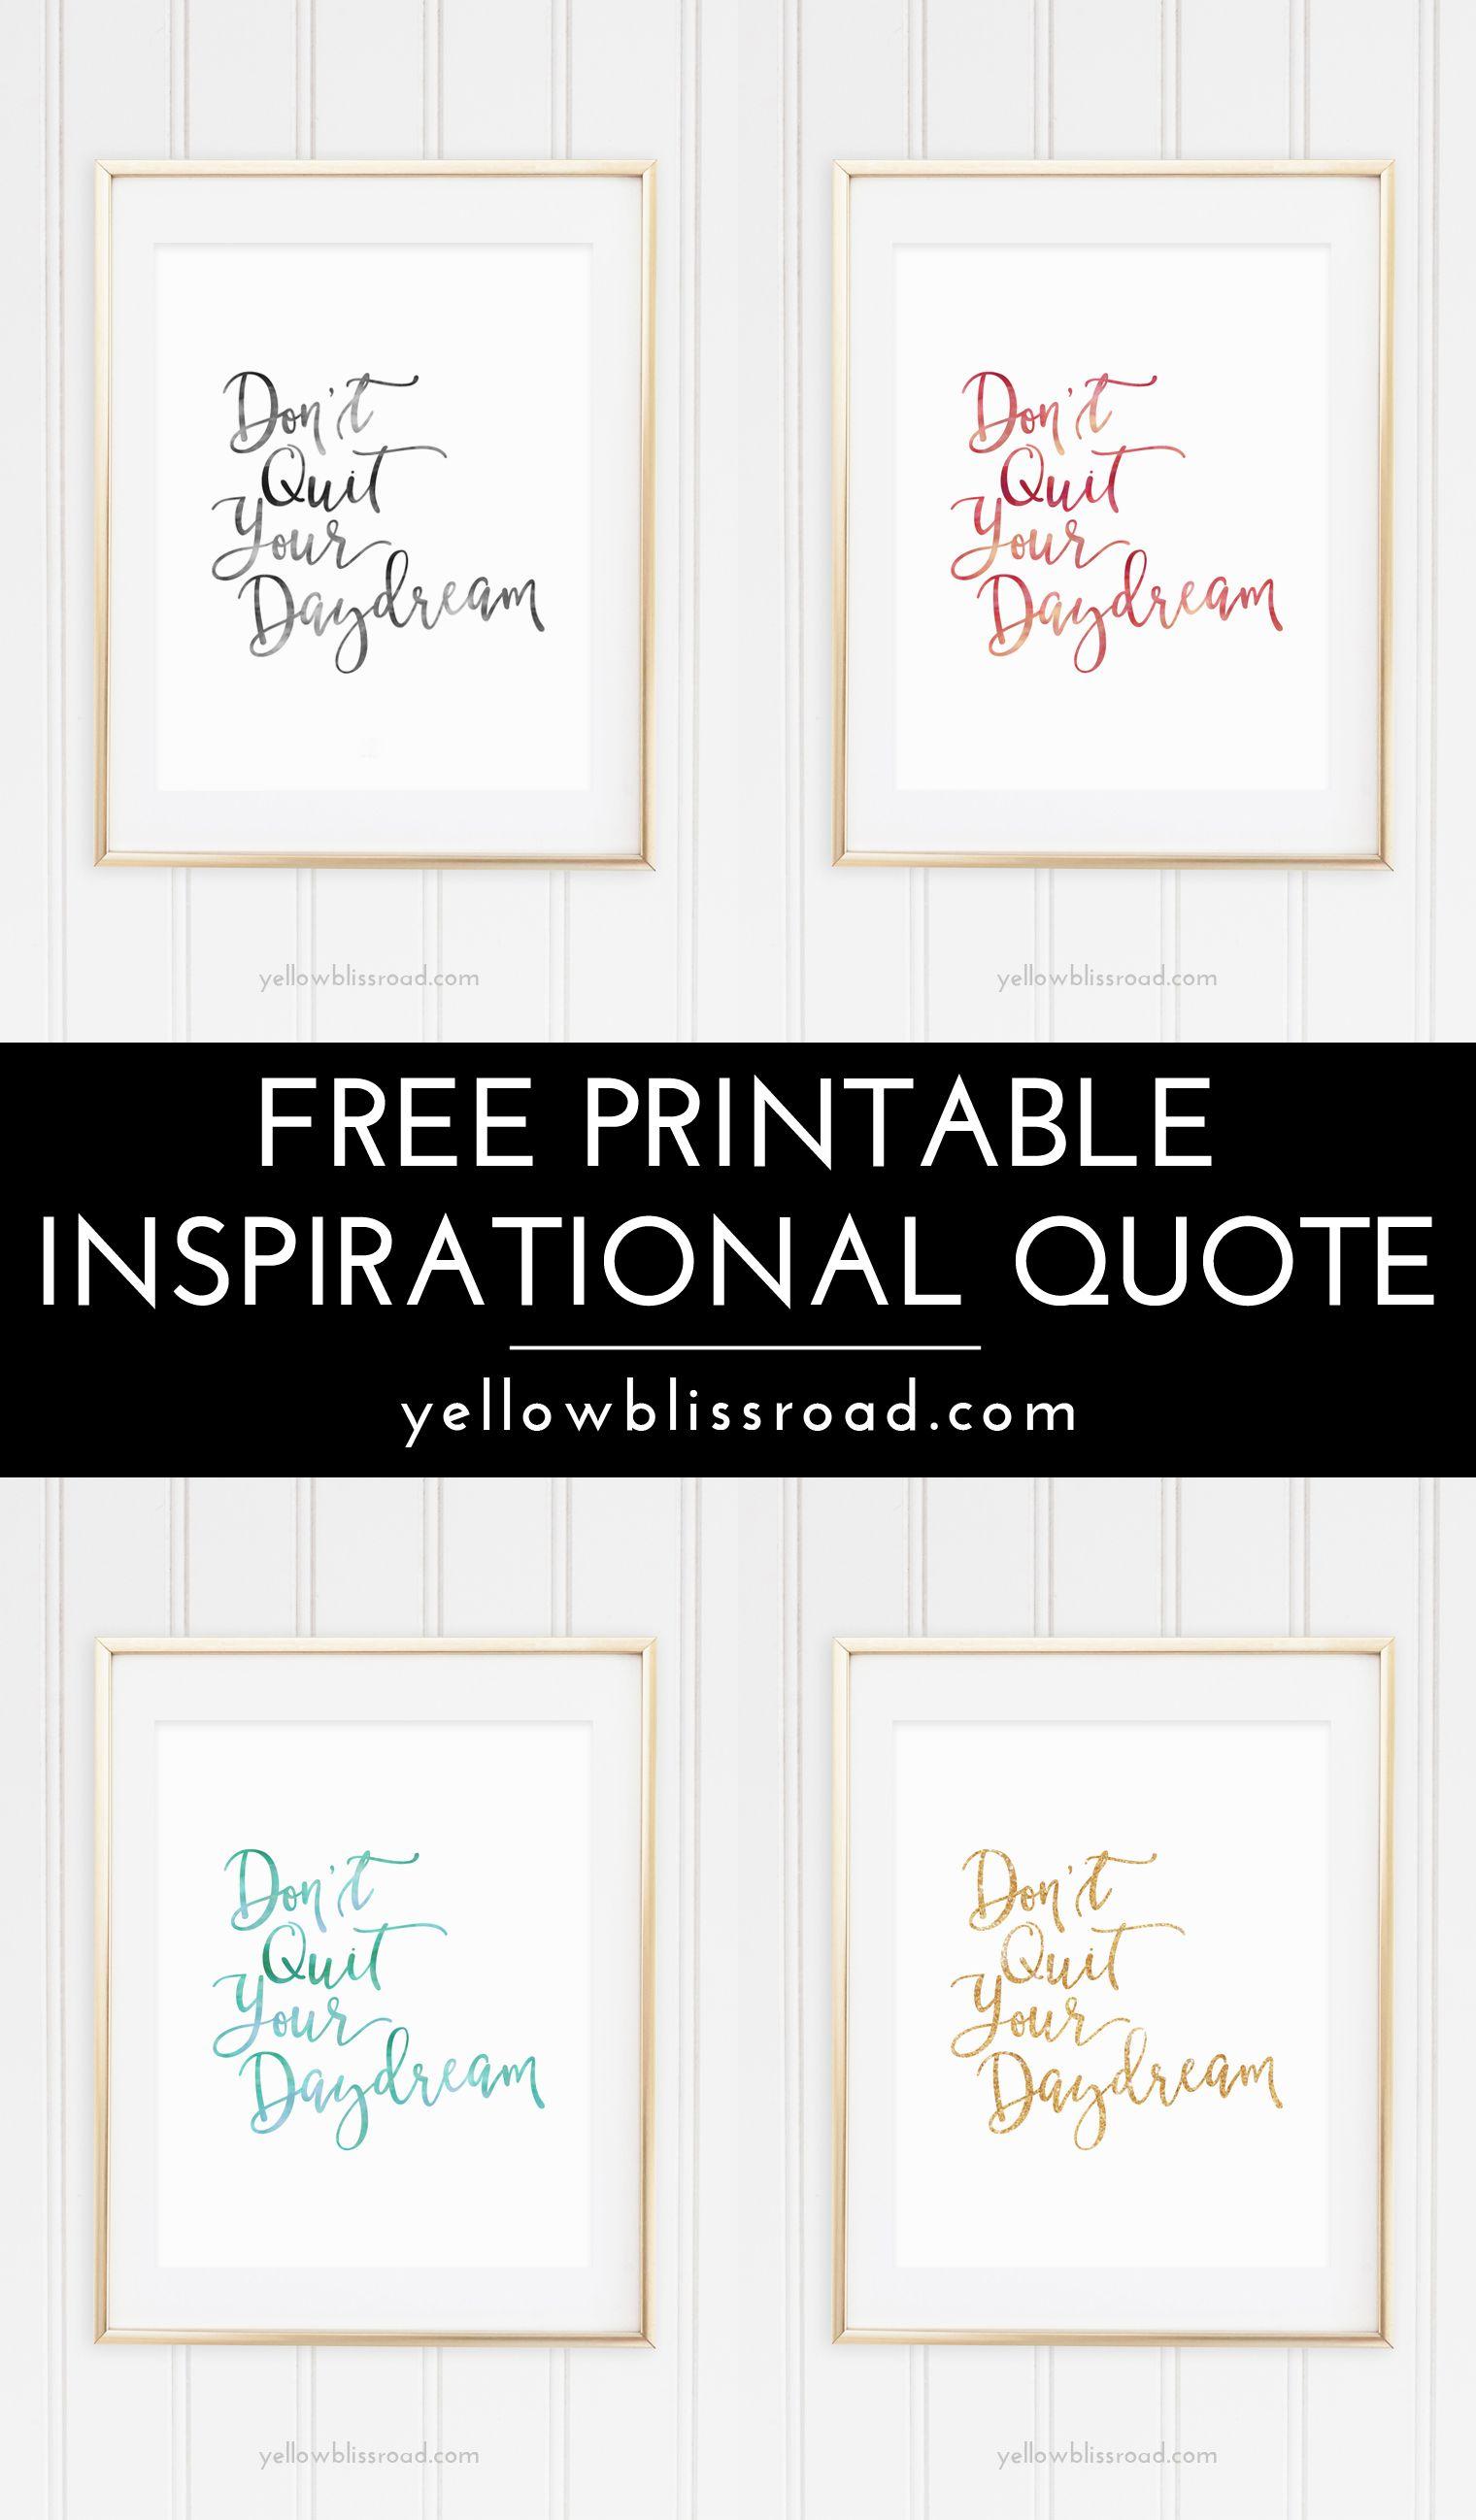 Free Inspiration Quote Printable   Free Printable Wall Art, Quotes - Free Printable Quotes Templates